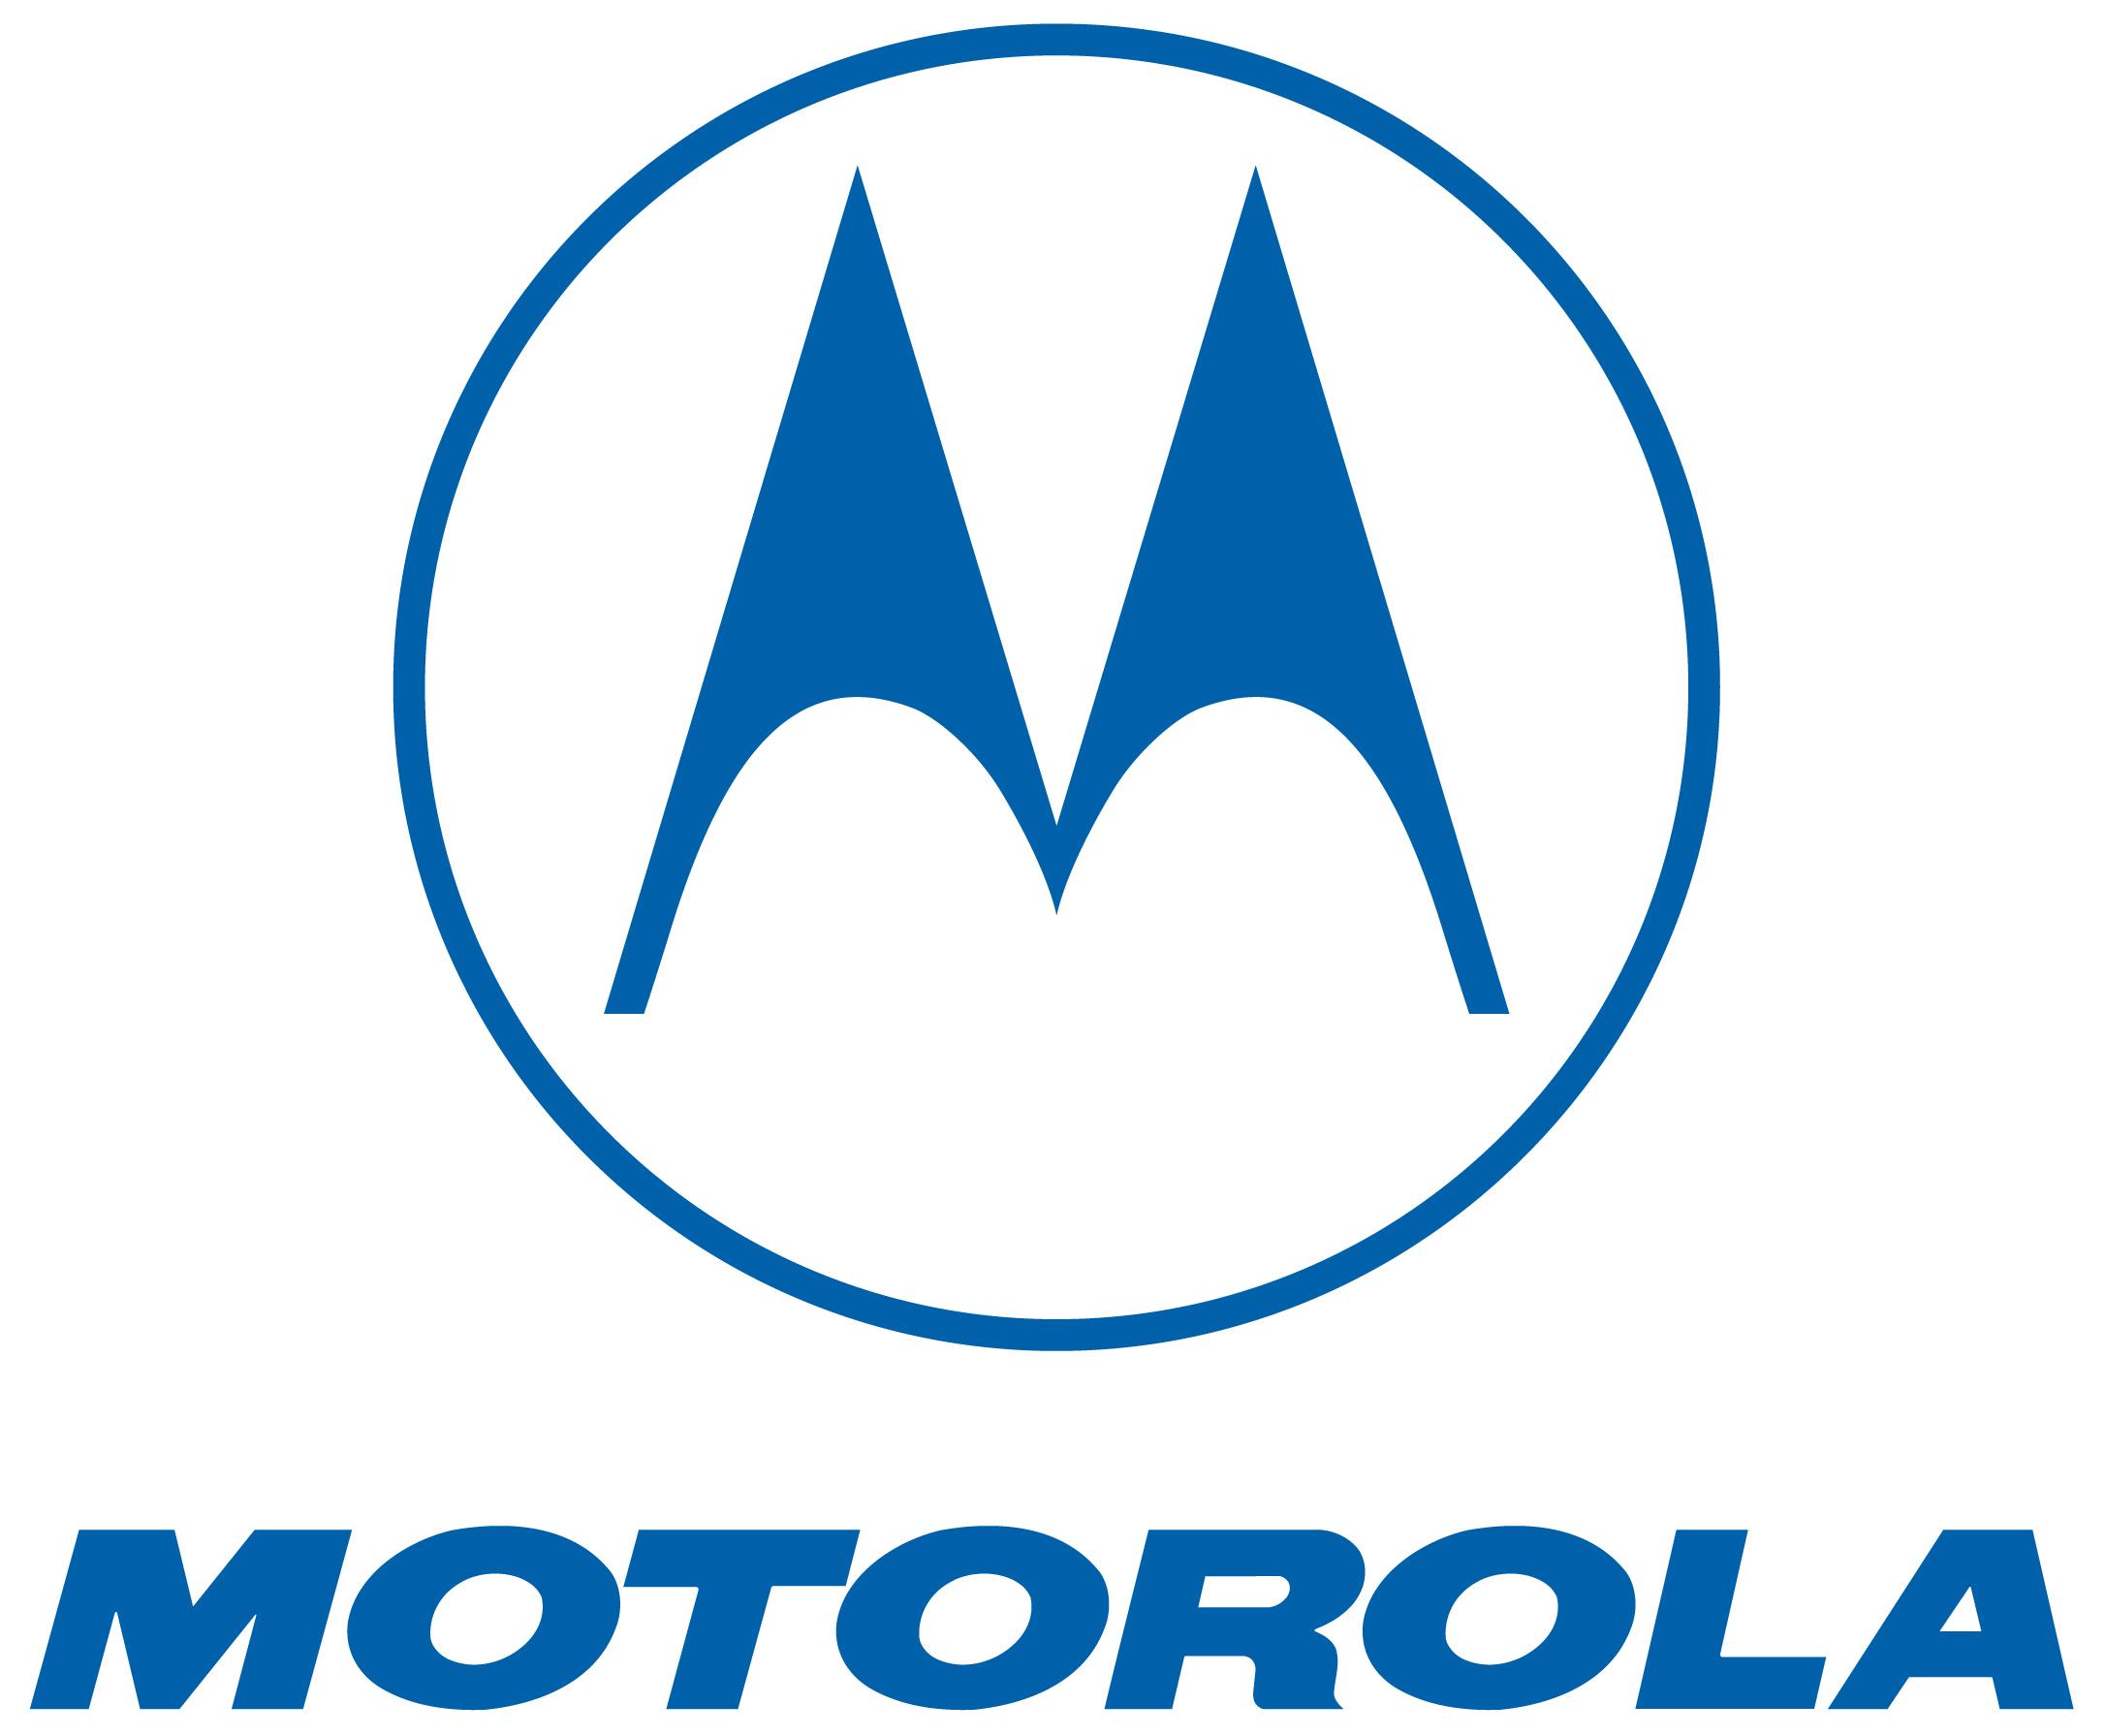 Motorola-brand1.jpg